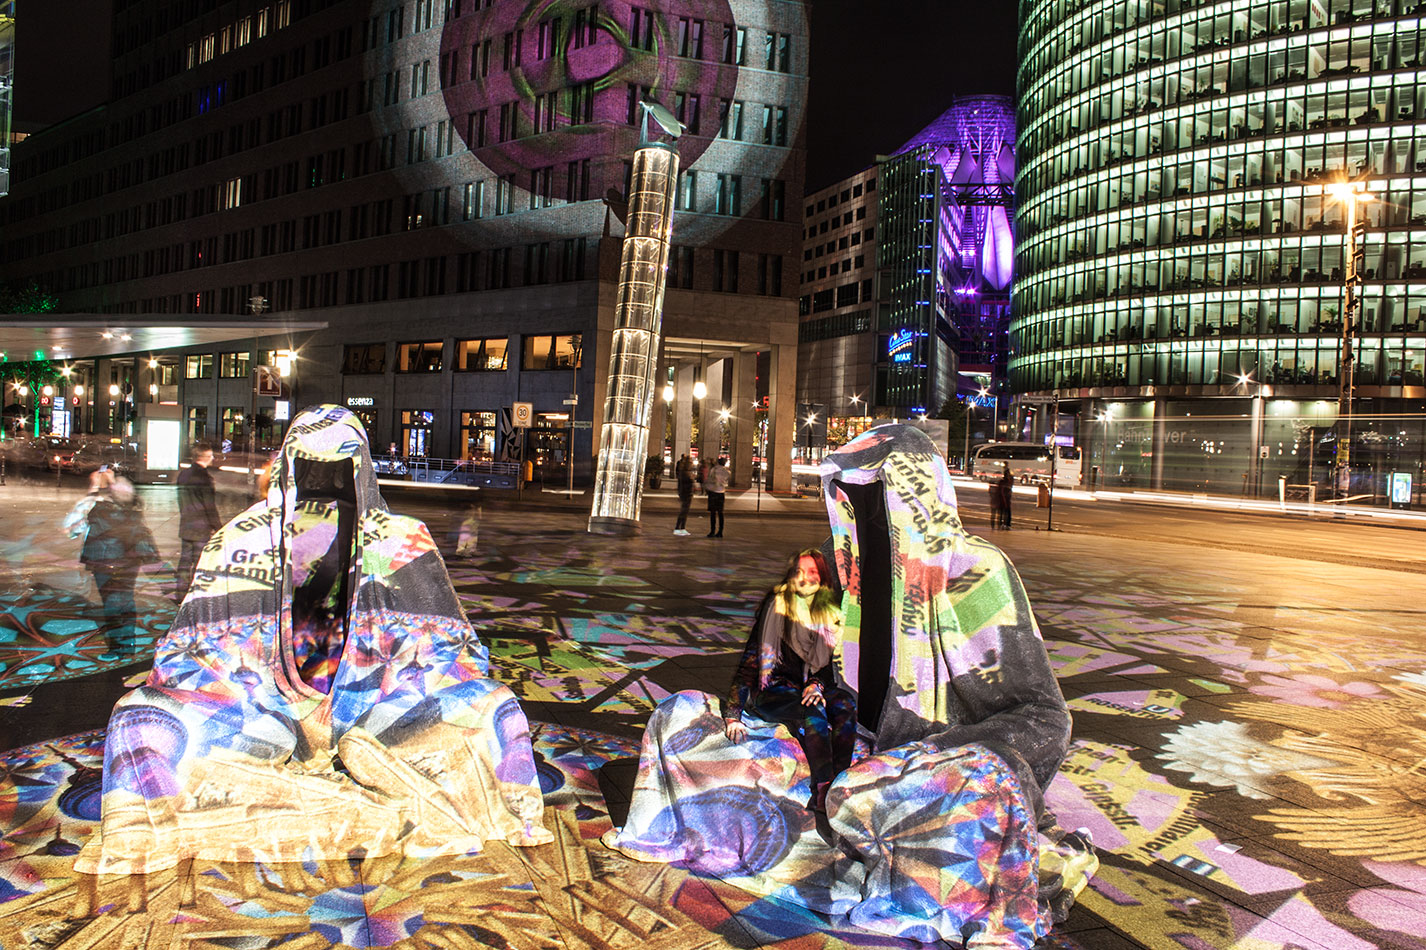 festival-of-lights-berlin-potzdamer-platz-light-art-show-exhibition-lumina-guardians-of-time-manfred-kili-kielnhofer-contemporary-arts-design-large-scale-monumental-public-sculpture-3490